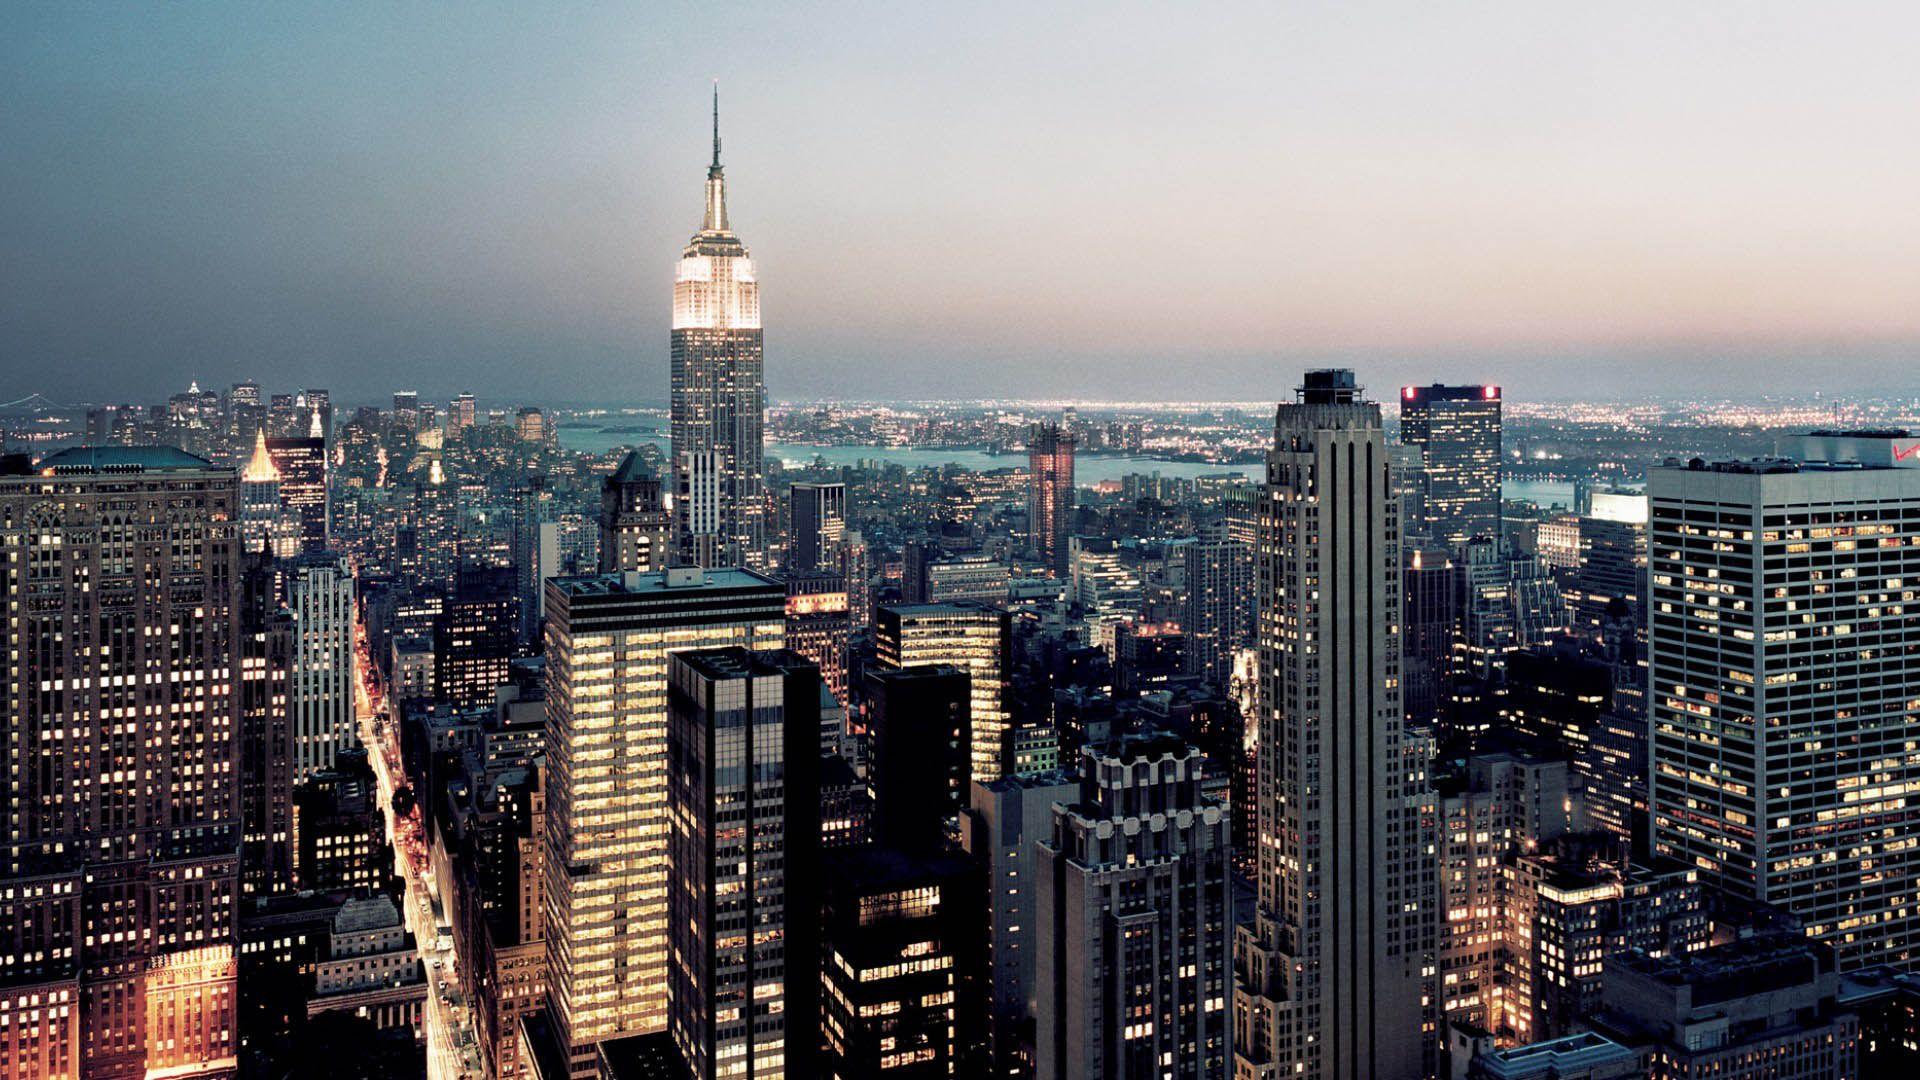 New York City Wallpapers 1920x1080 021 New York City Background New York Wallpaper New York